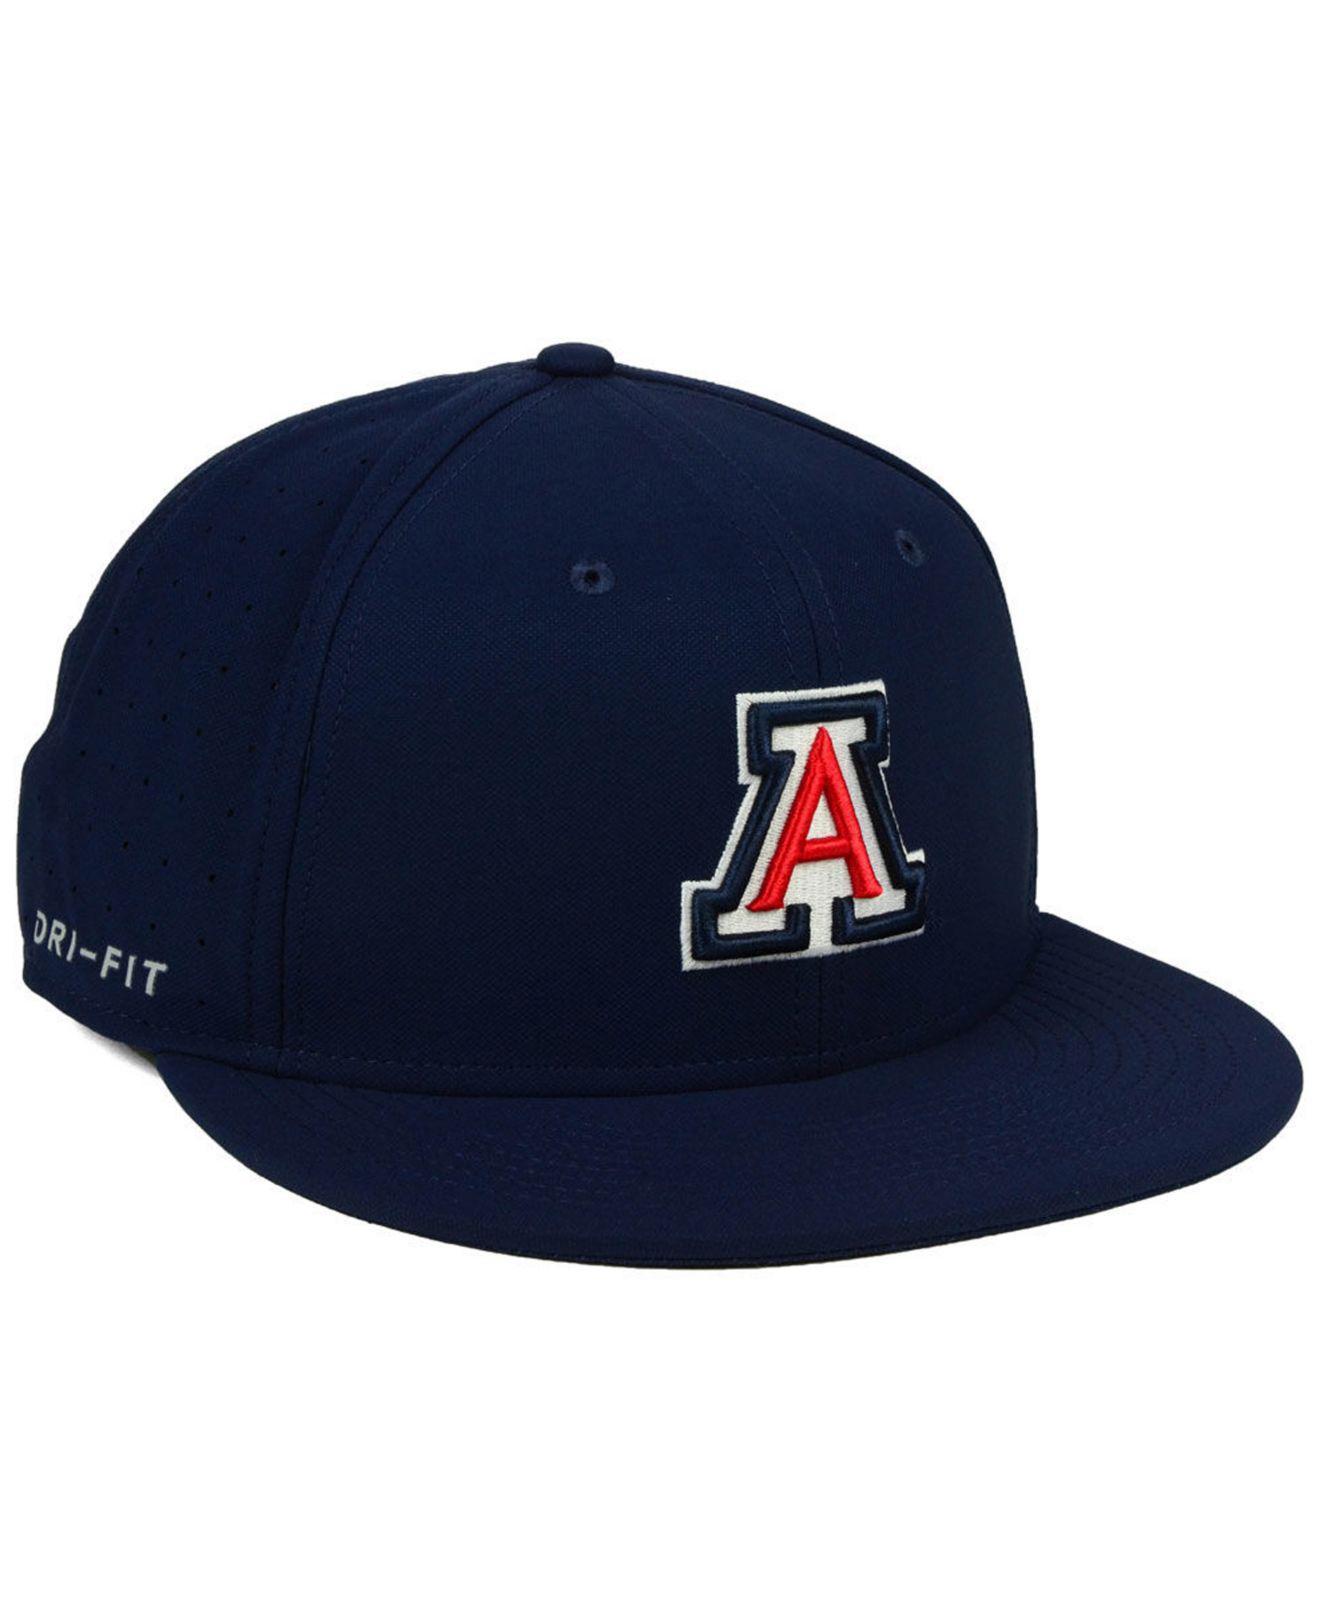 328e8bb2f99b4 ... cheapest nike blue arizona wildcats aerobill true fitted baseball cap  for men lyst. view fullscreen